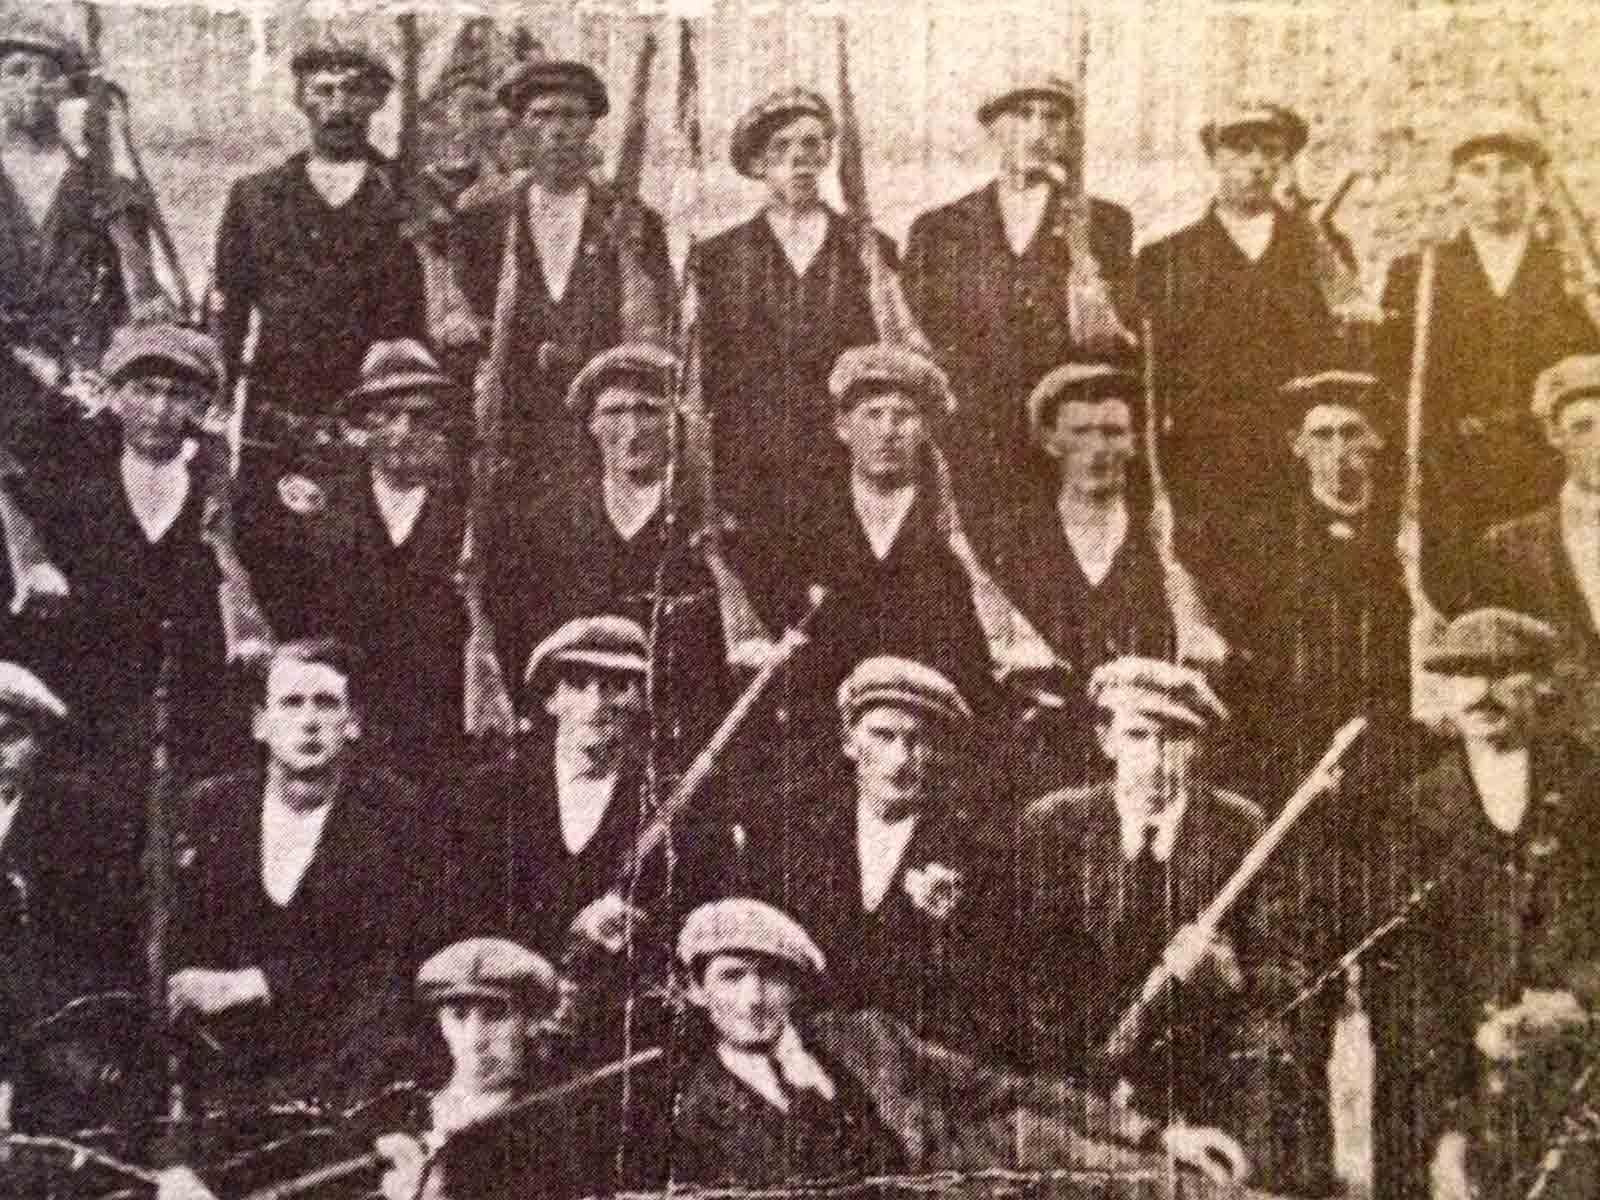 1916 & Troubles